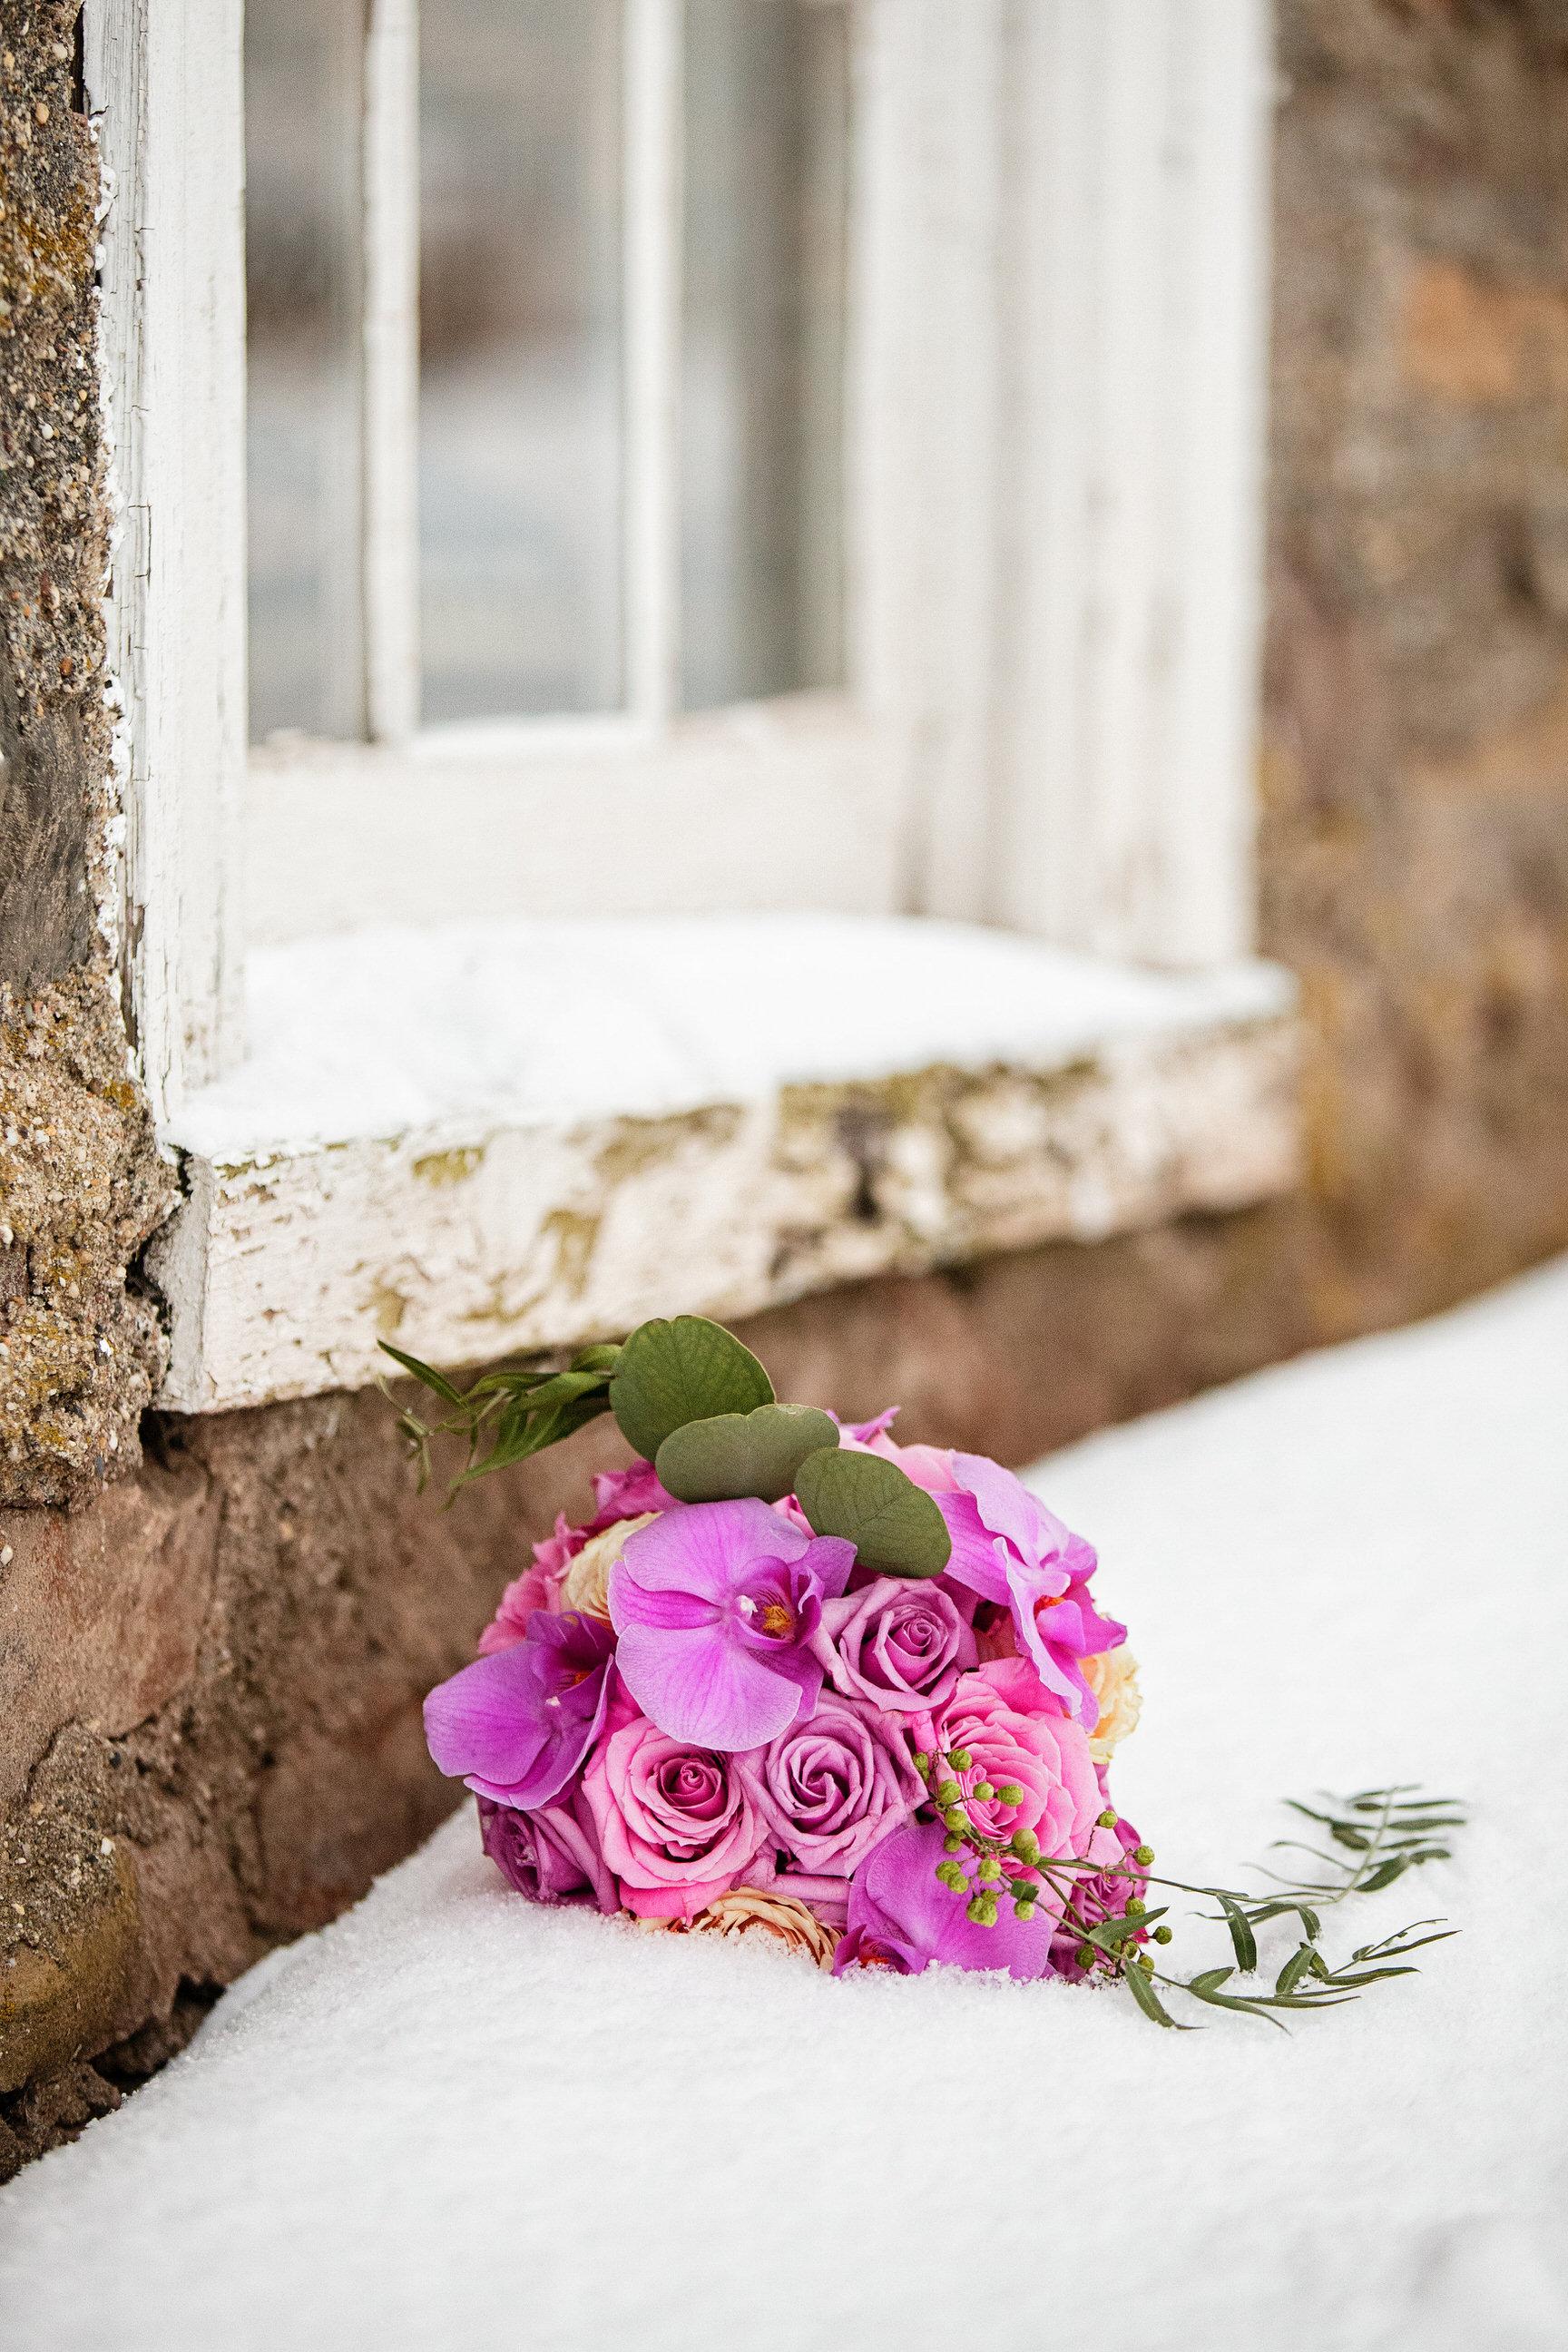 01 Radiant Orchid Bouquet in the Snow Winter Wedding Philadelphia Wedding Planner.jpg